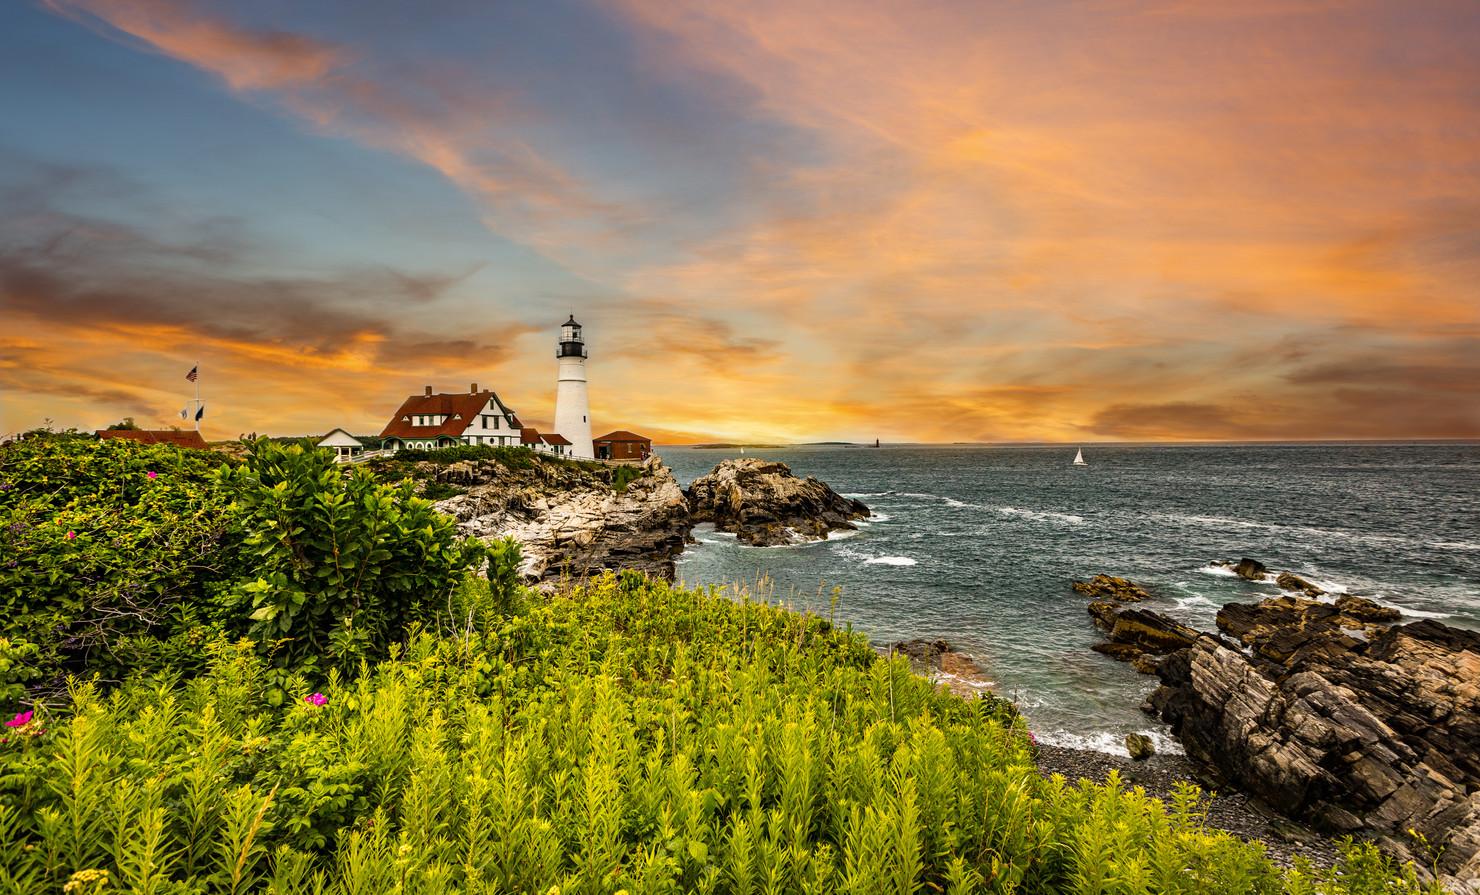 lighthouse20.jpg